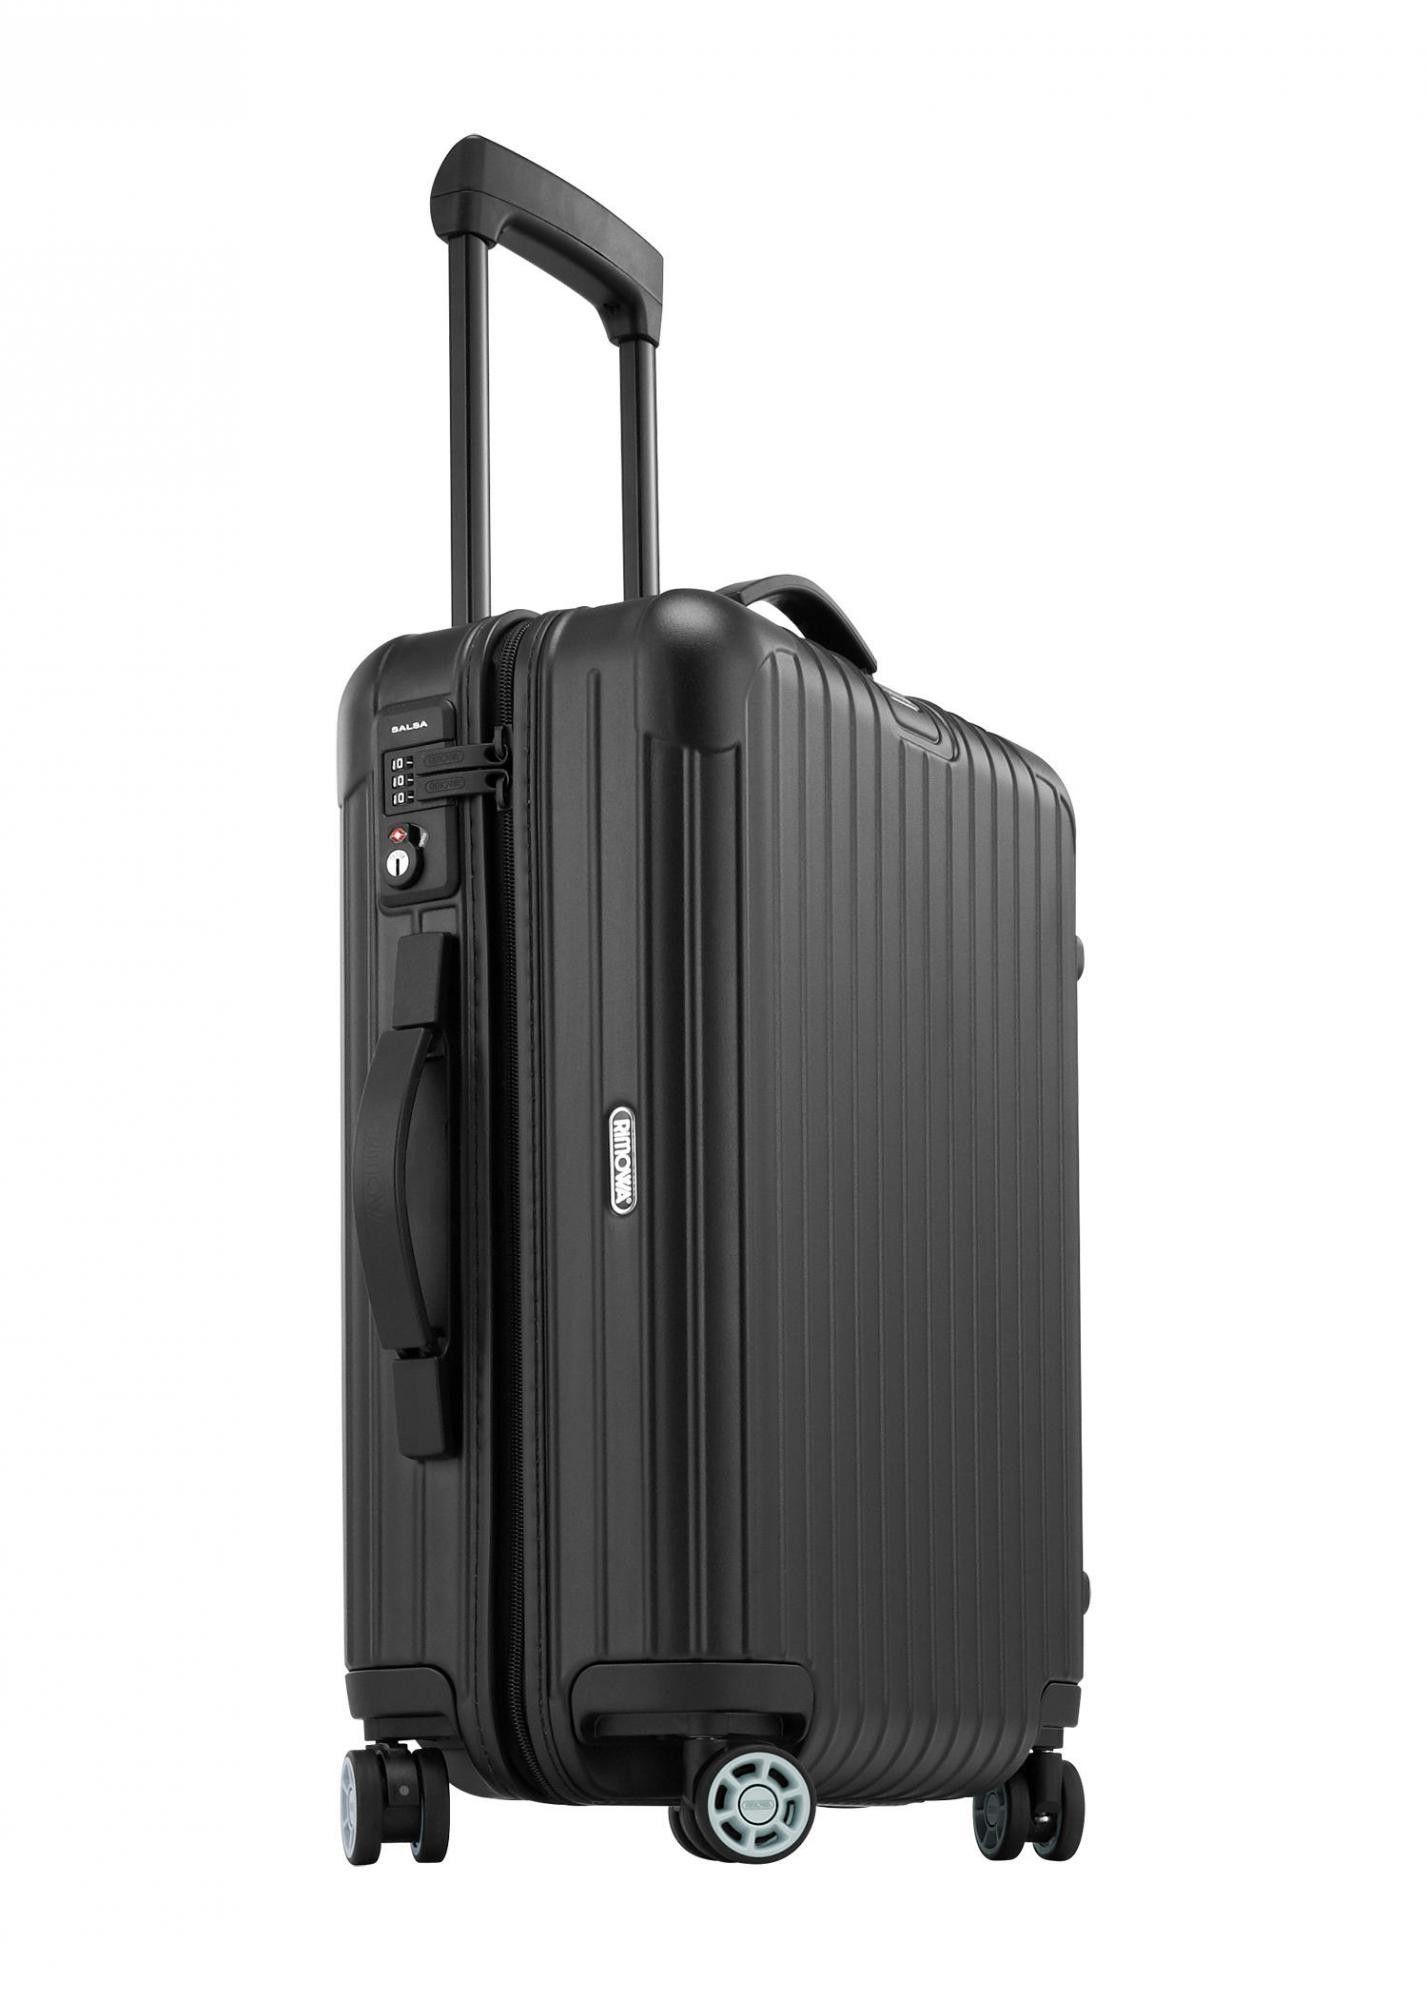 Merveilleux Rimowa Salsa Cabin Multiwheel 810.56.32.4 | Luggage Pros